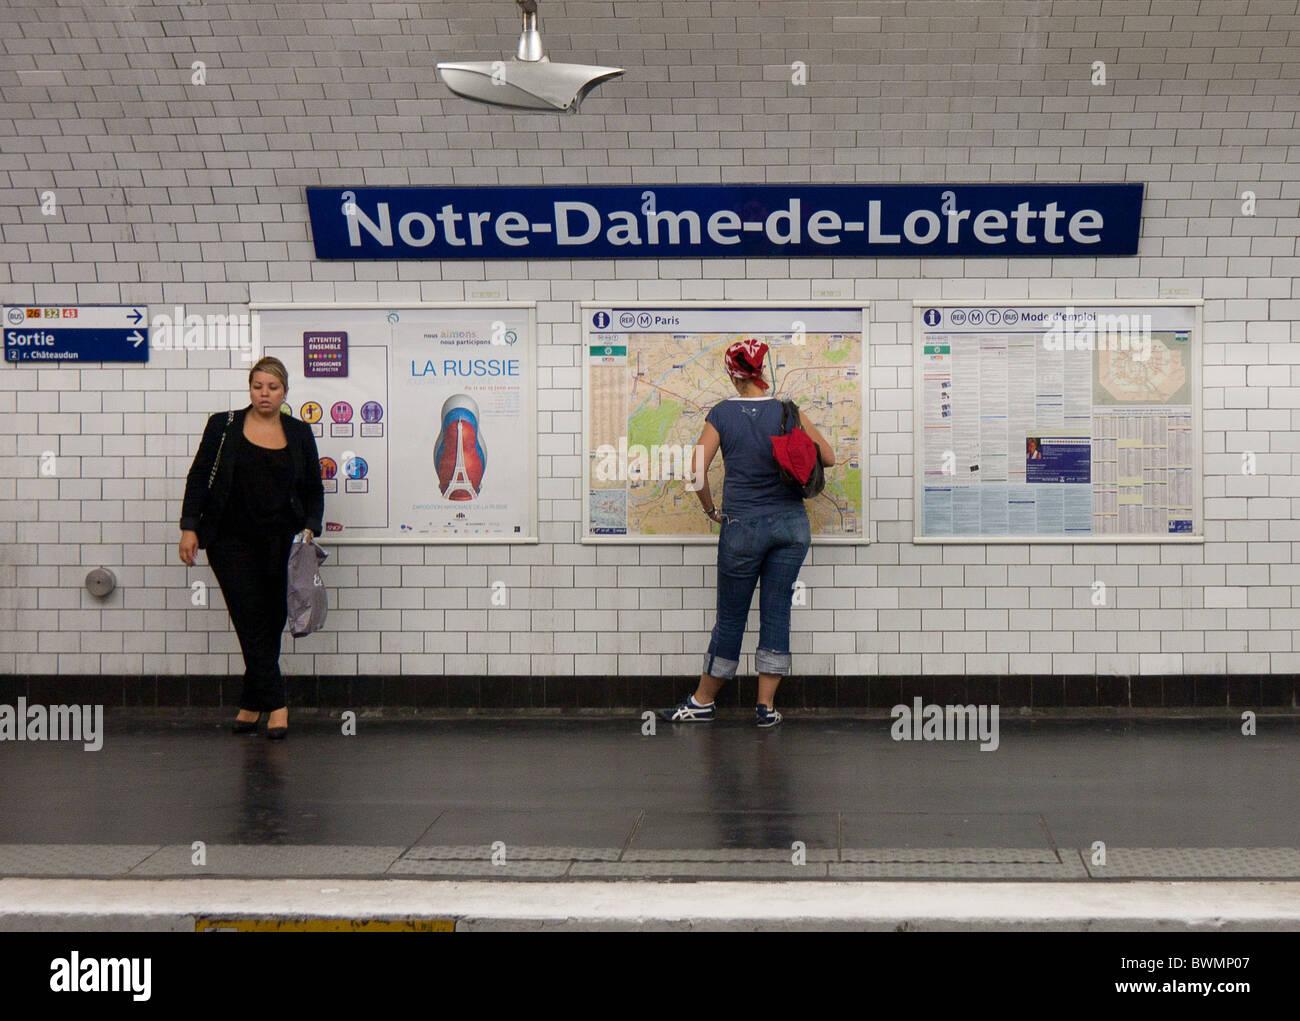 underground platform sign not london stock photos. Black Bedroom Furniture Sets. Home Design Ideas